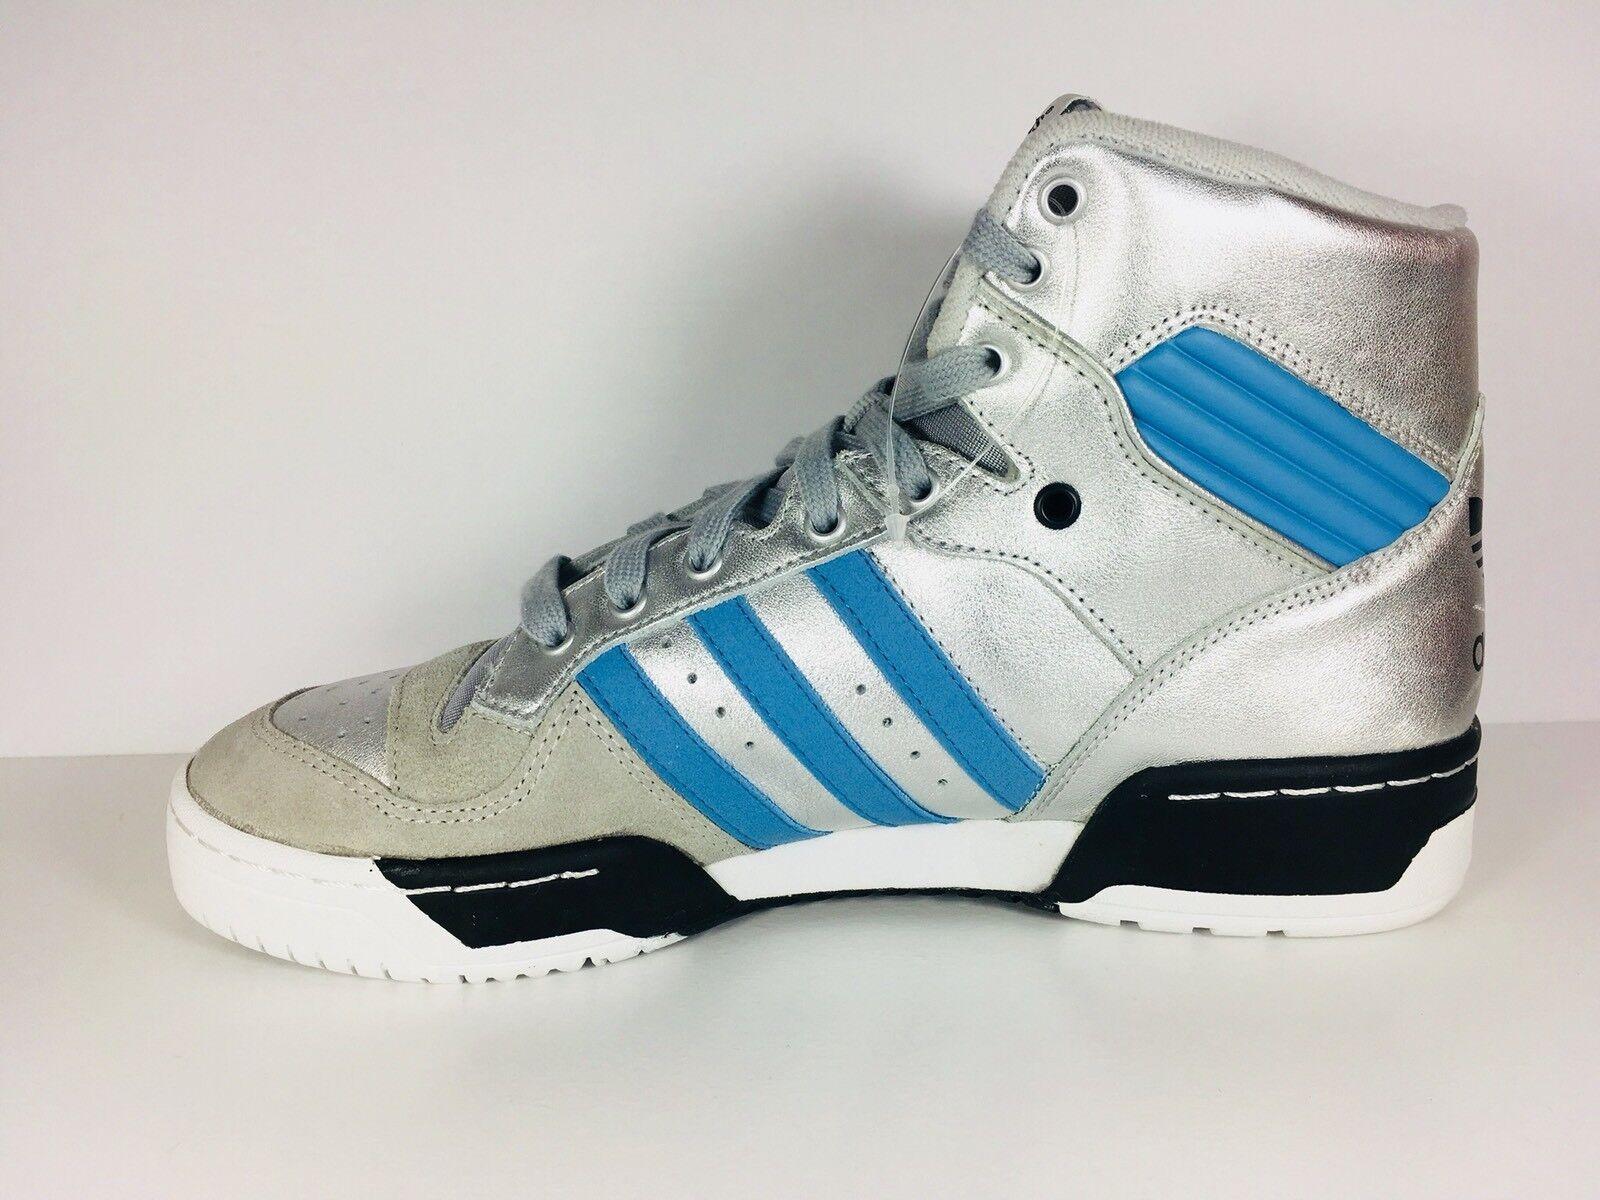 Adidas rivarly ciao nigo 2 tokyo silver / blu blu blu / grigio m21517 noi taglia 9 la libera navigazione fc35a3